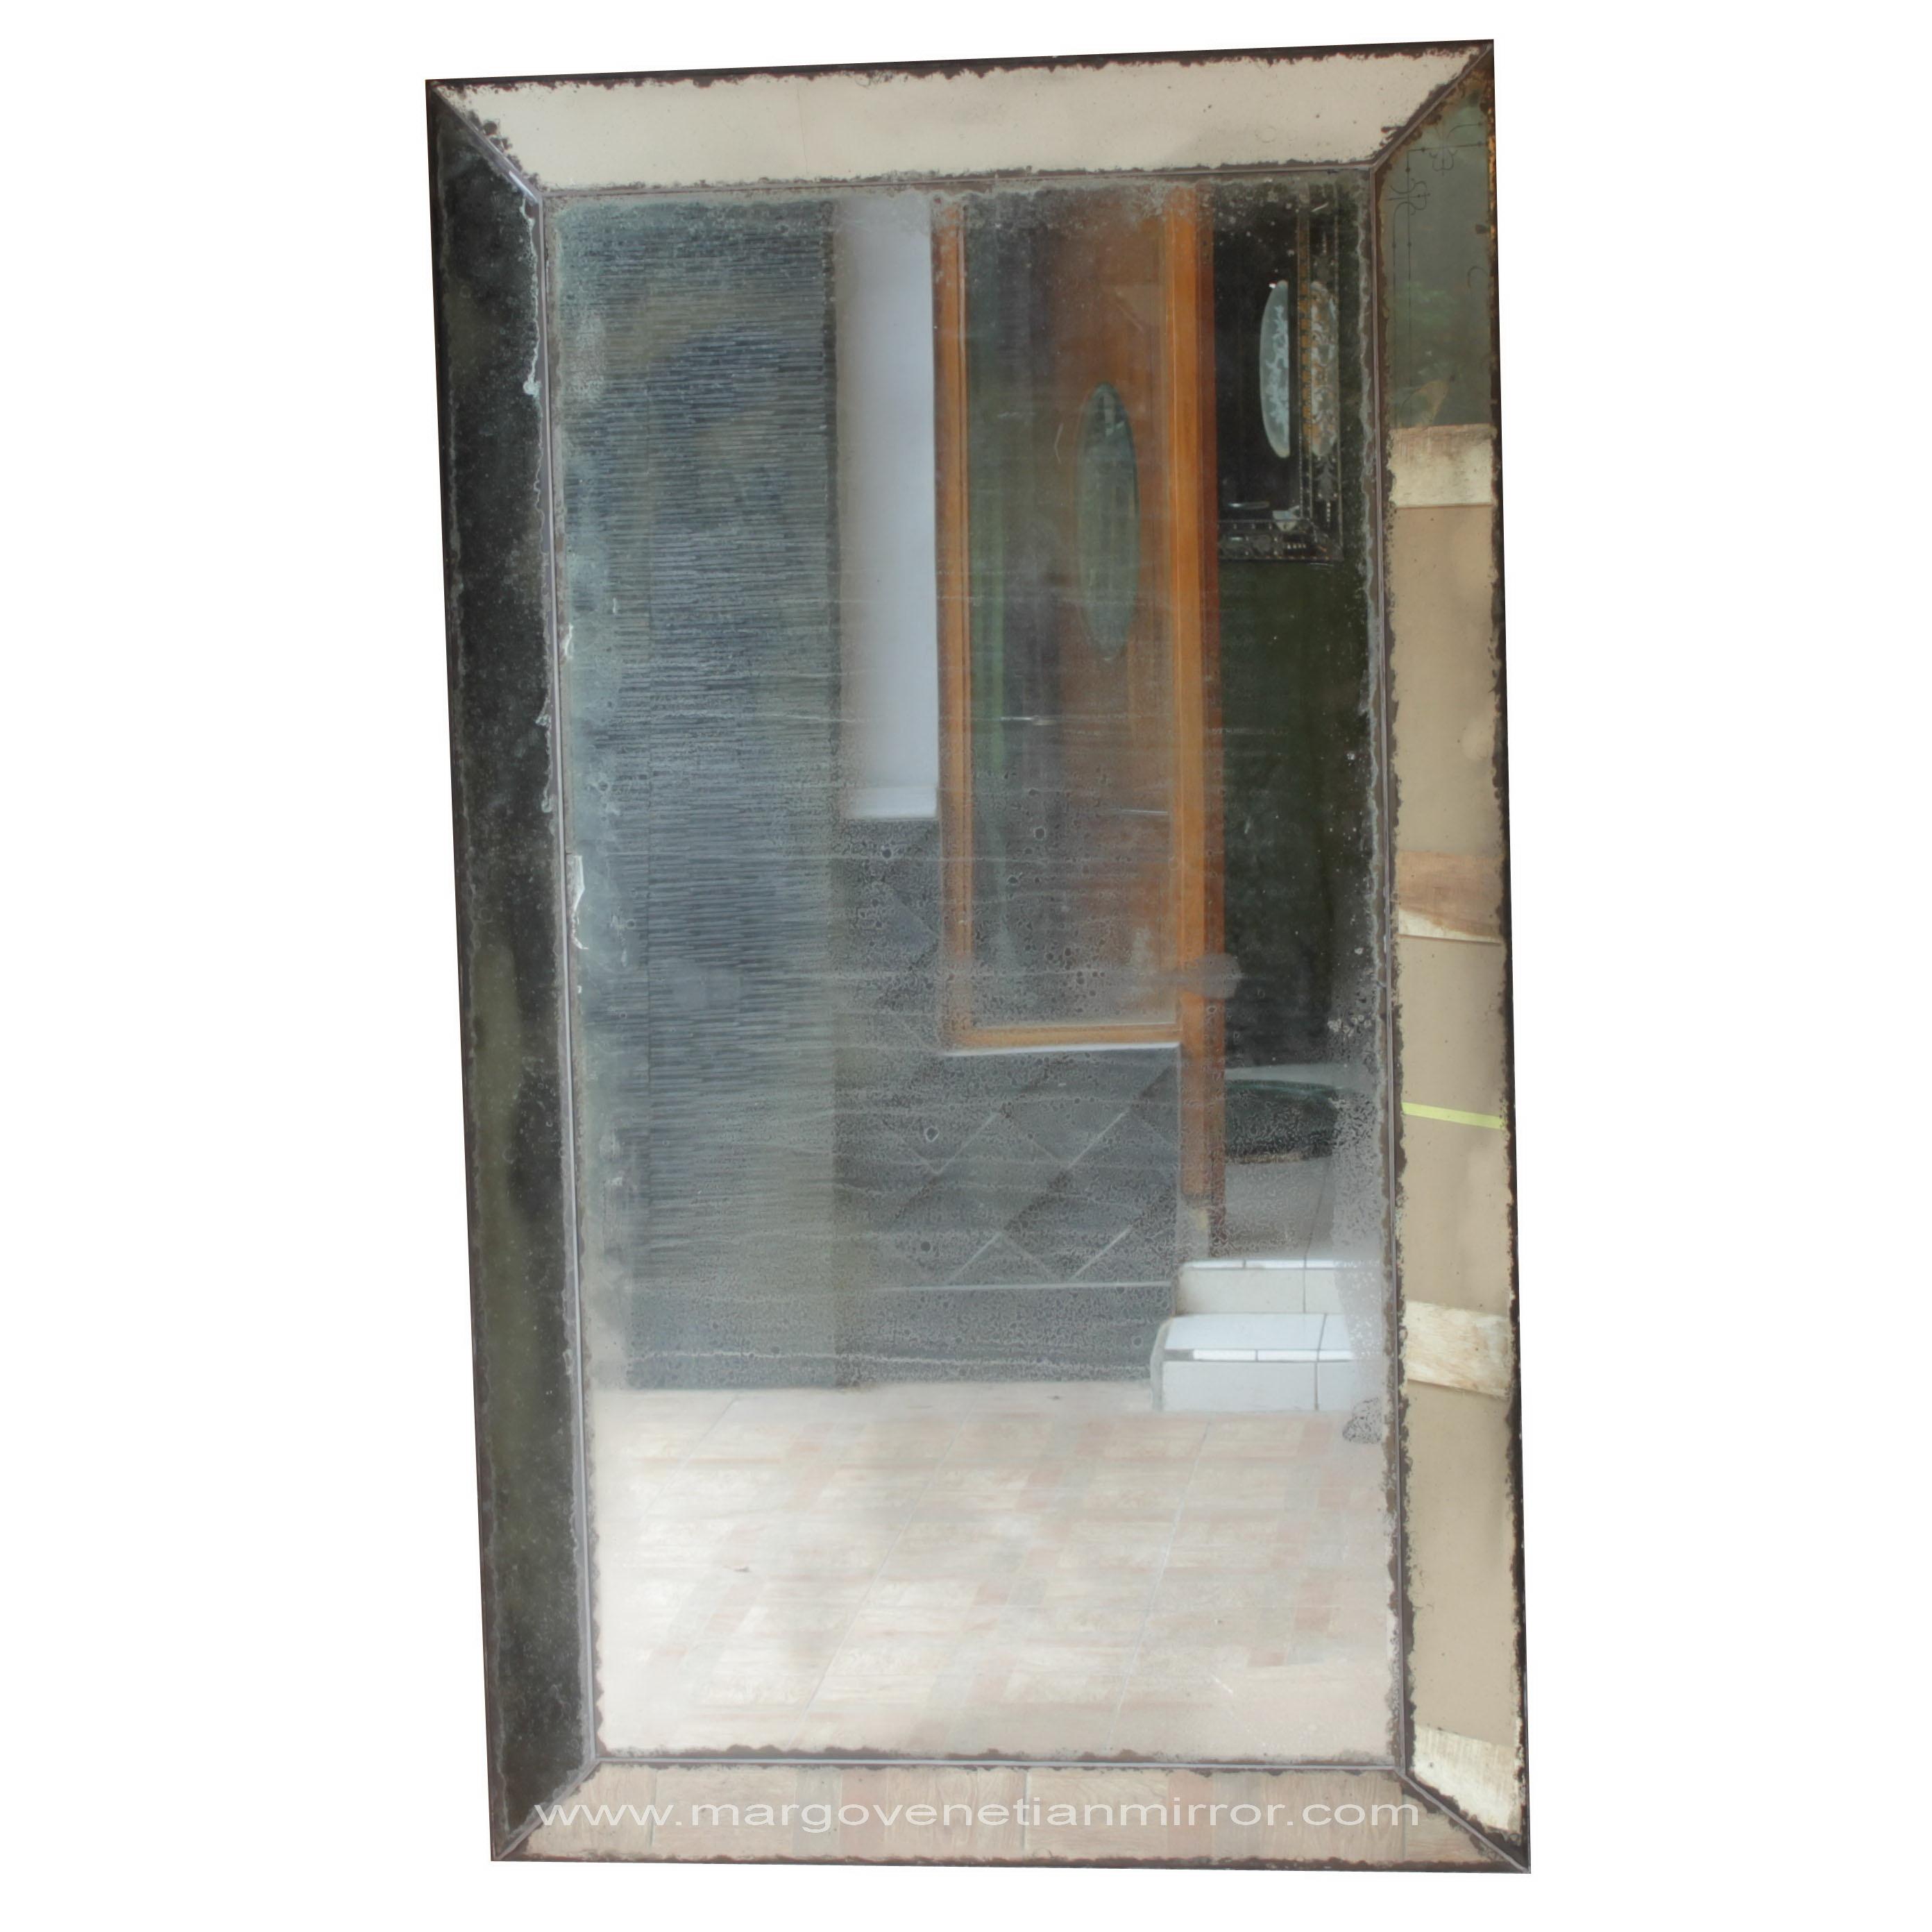 bedside zoom mirror furniture cupboard romano mirrored crystal venetian